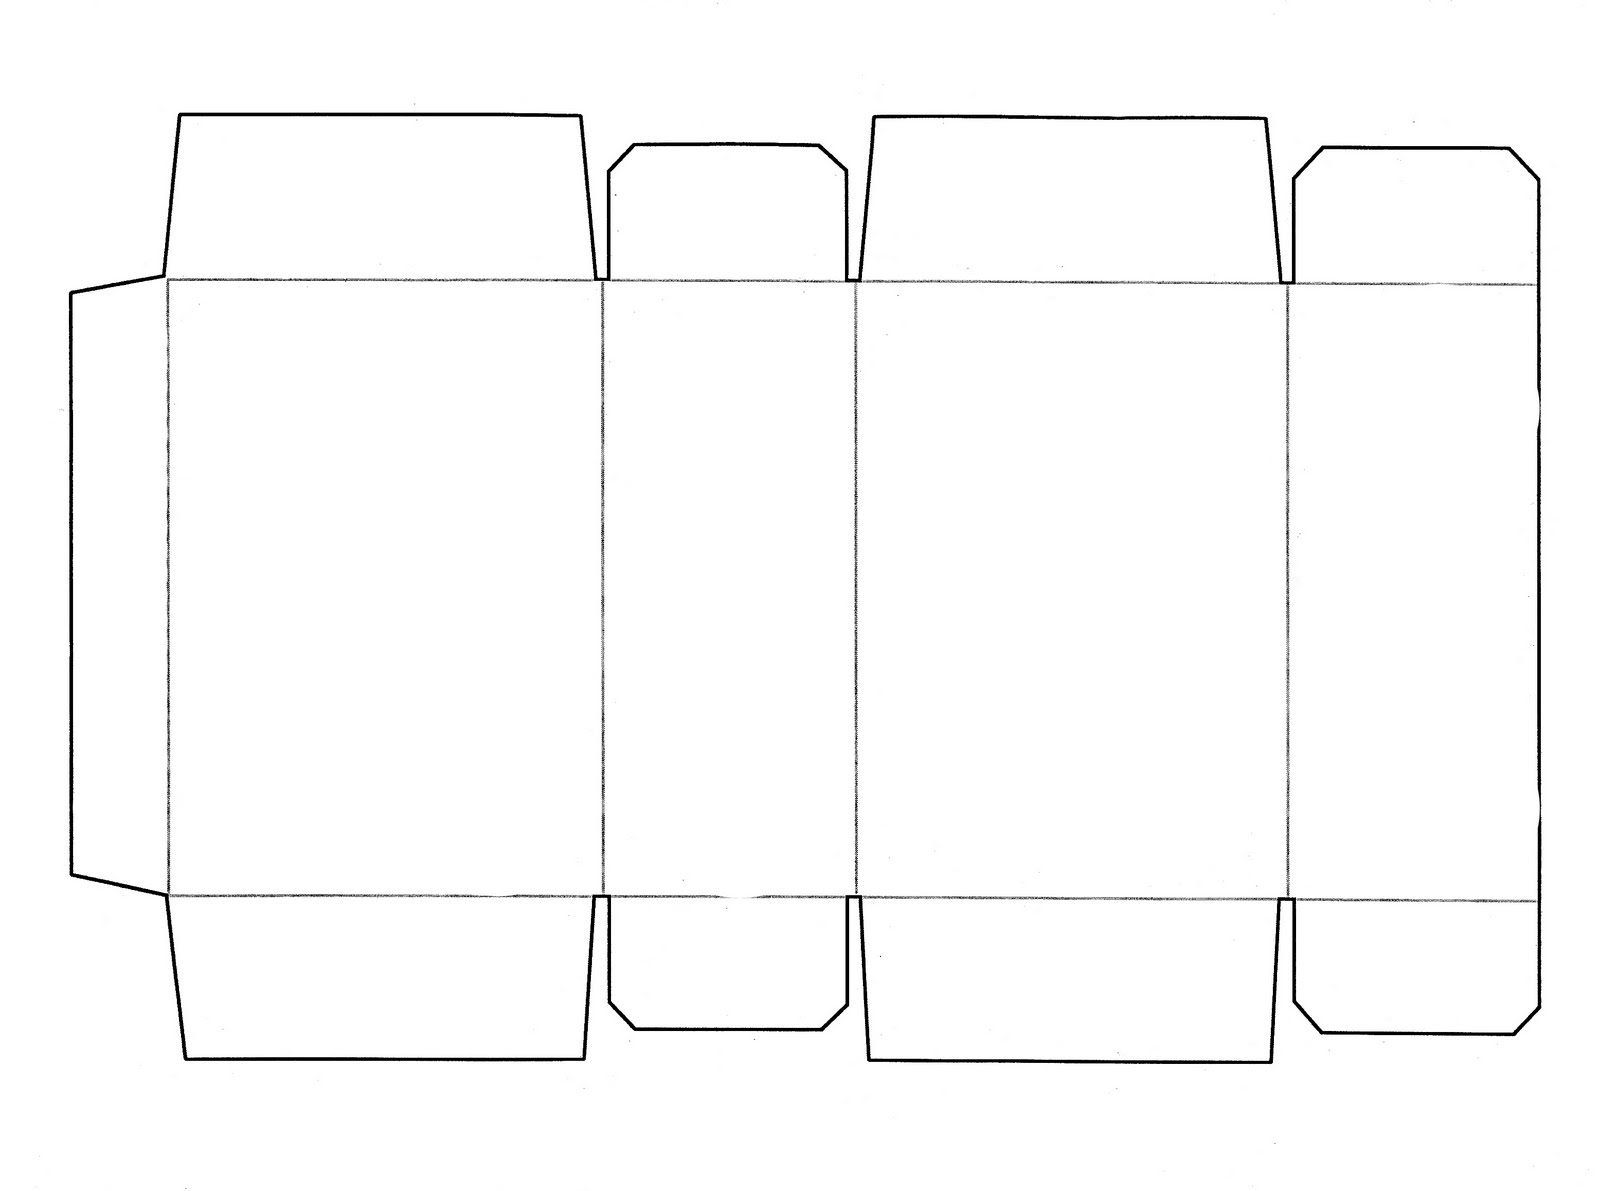 custom paper size indesign download